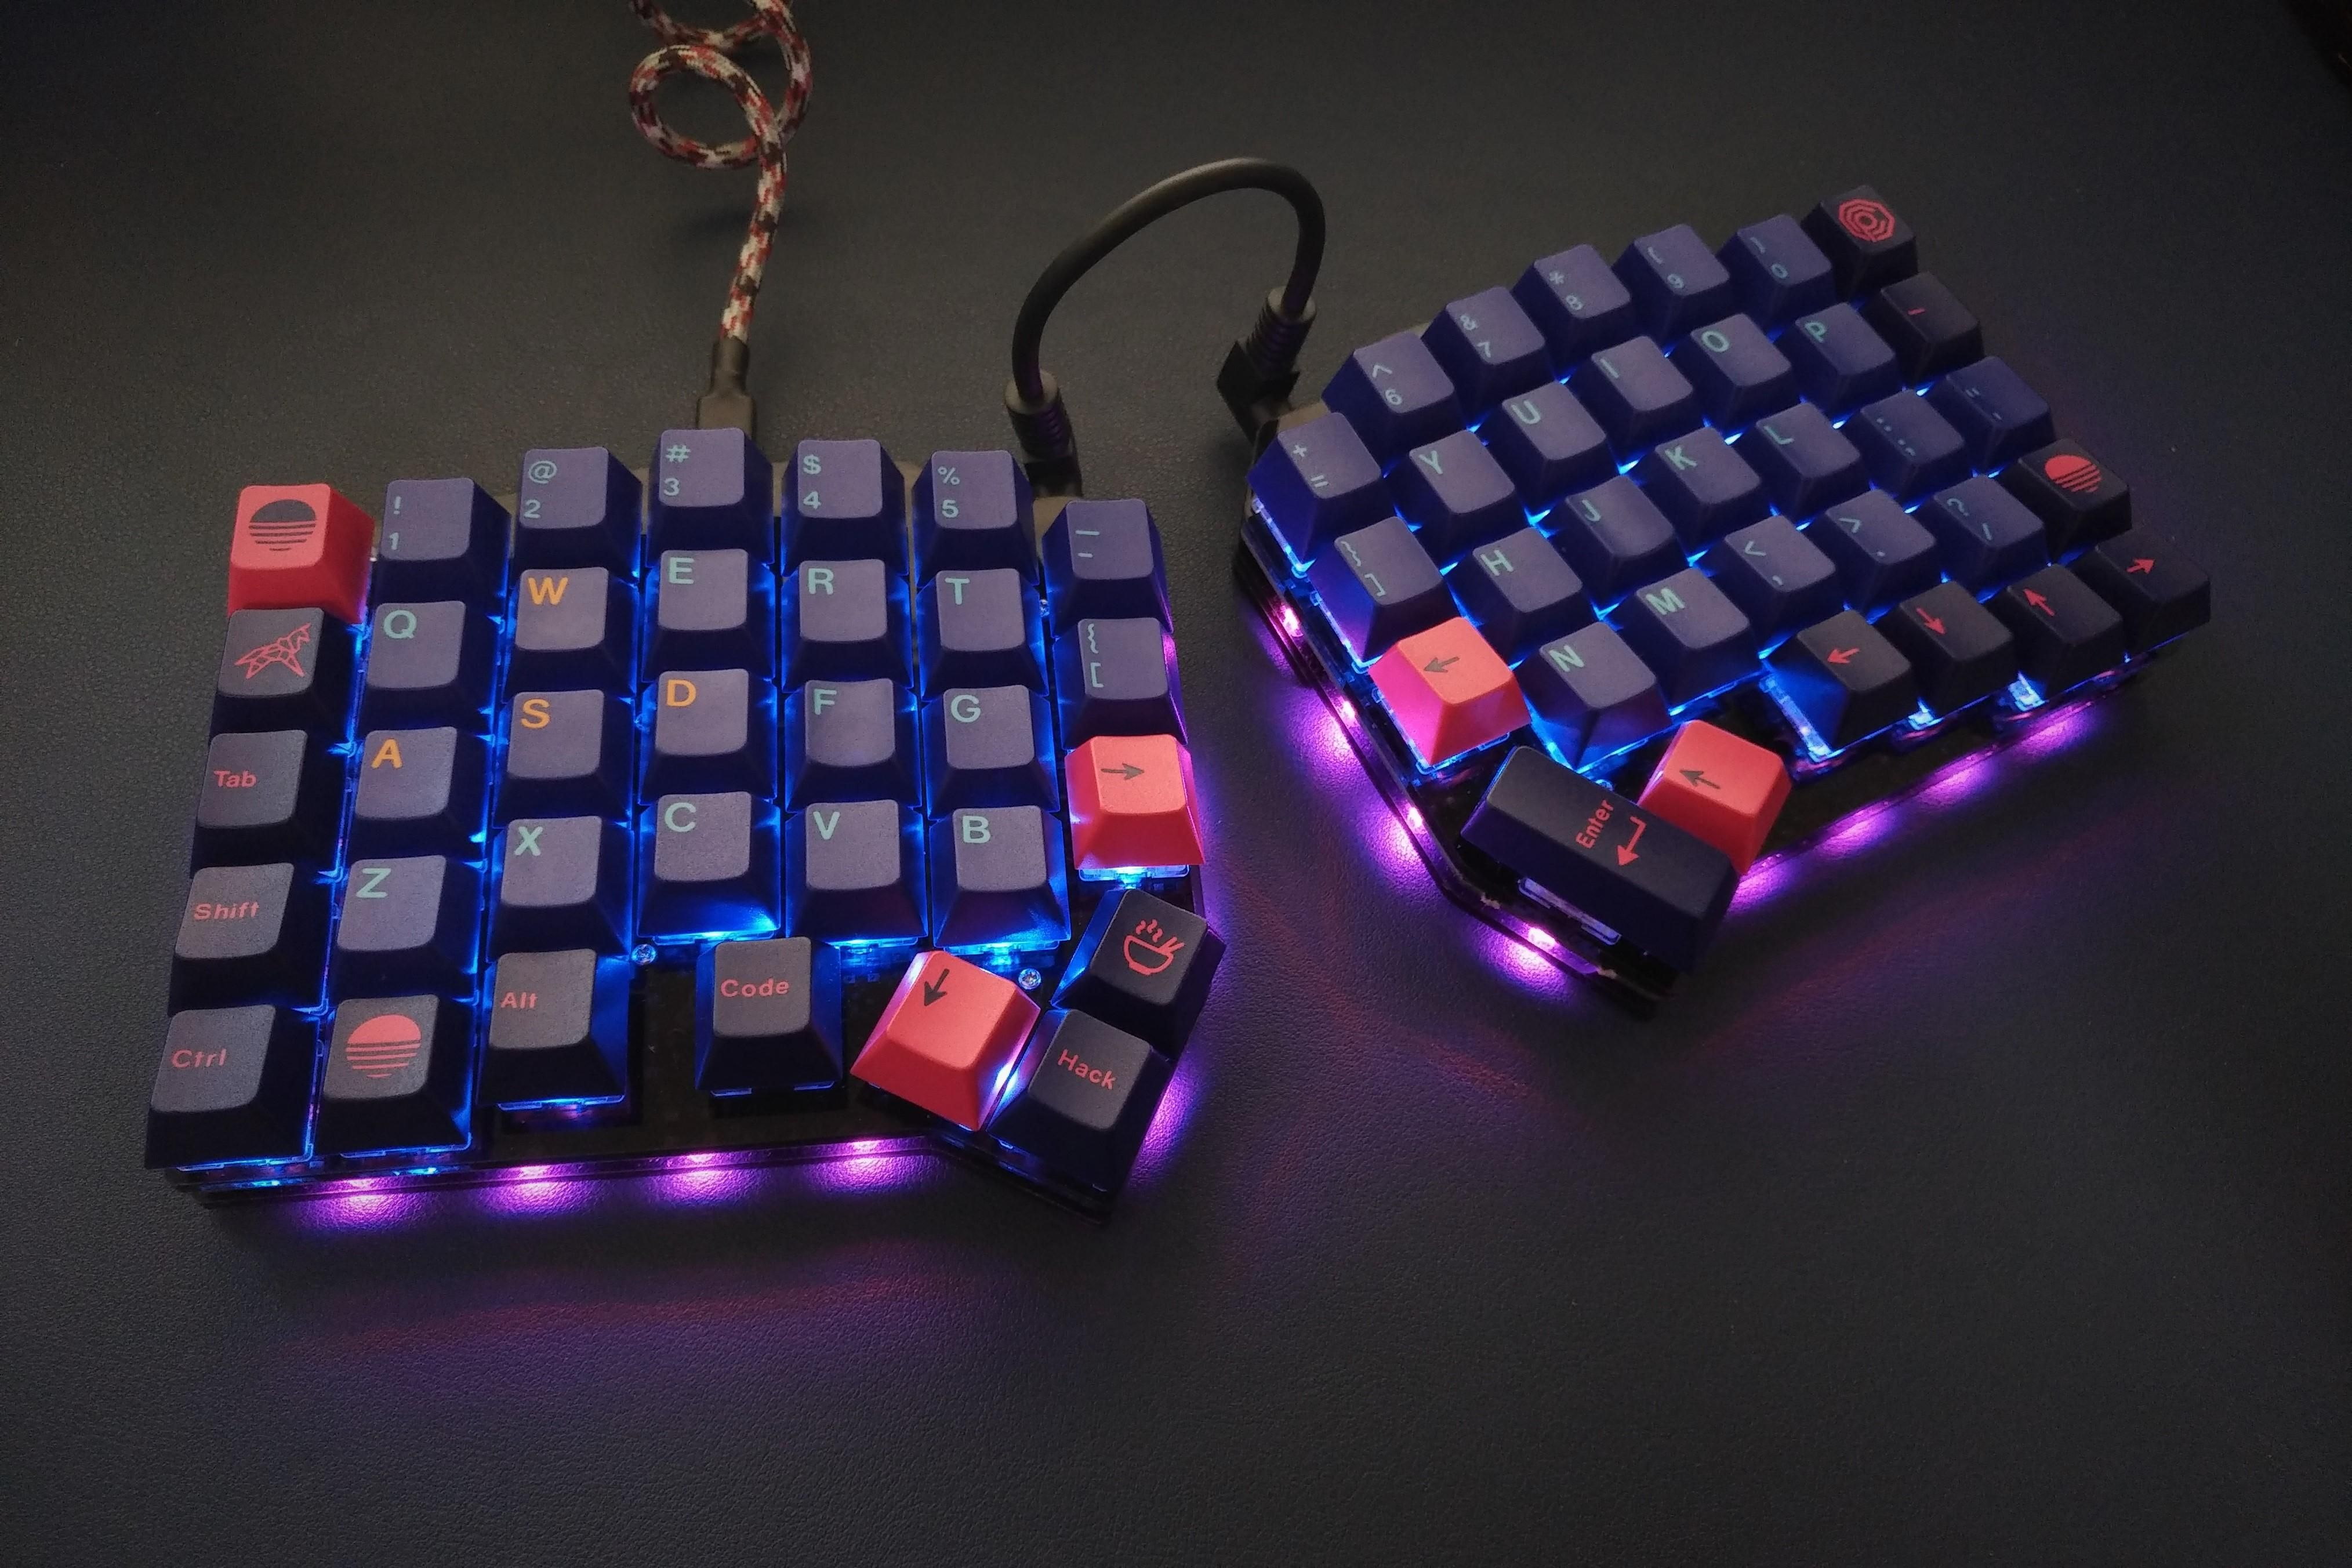 Ergodash I Designed A New Keyboard Mechanicalkeyboards Keyboard Mini Keyboard Pc Keyboard